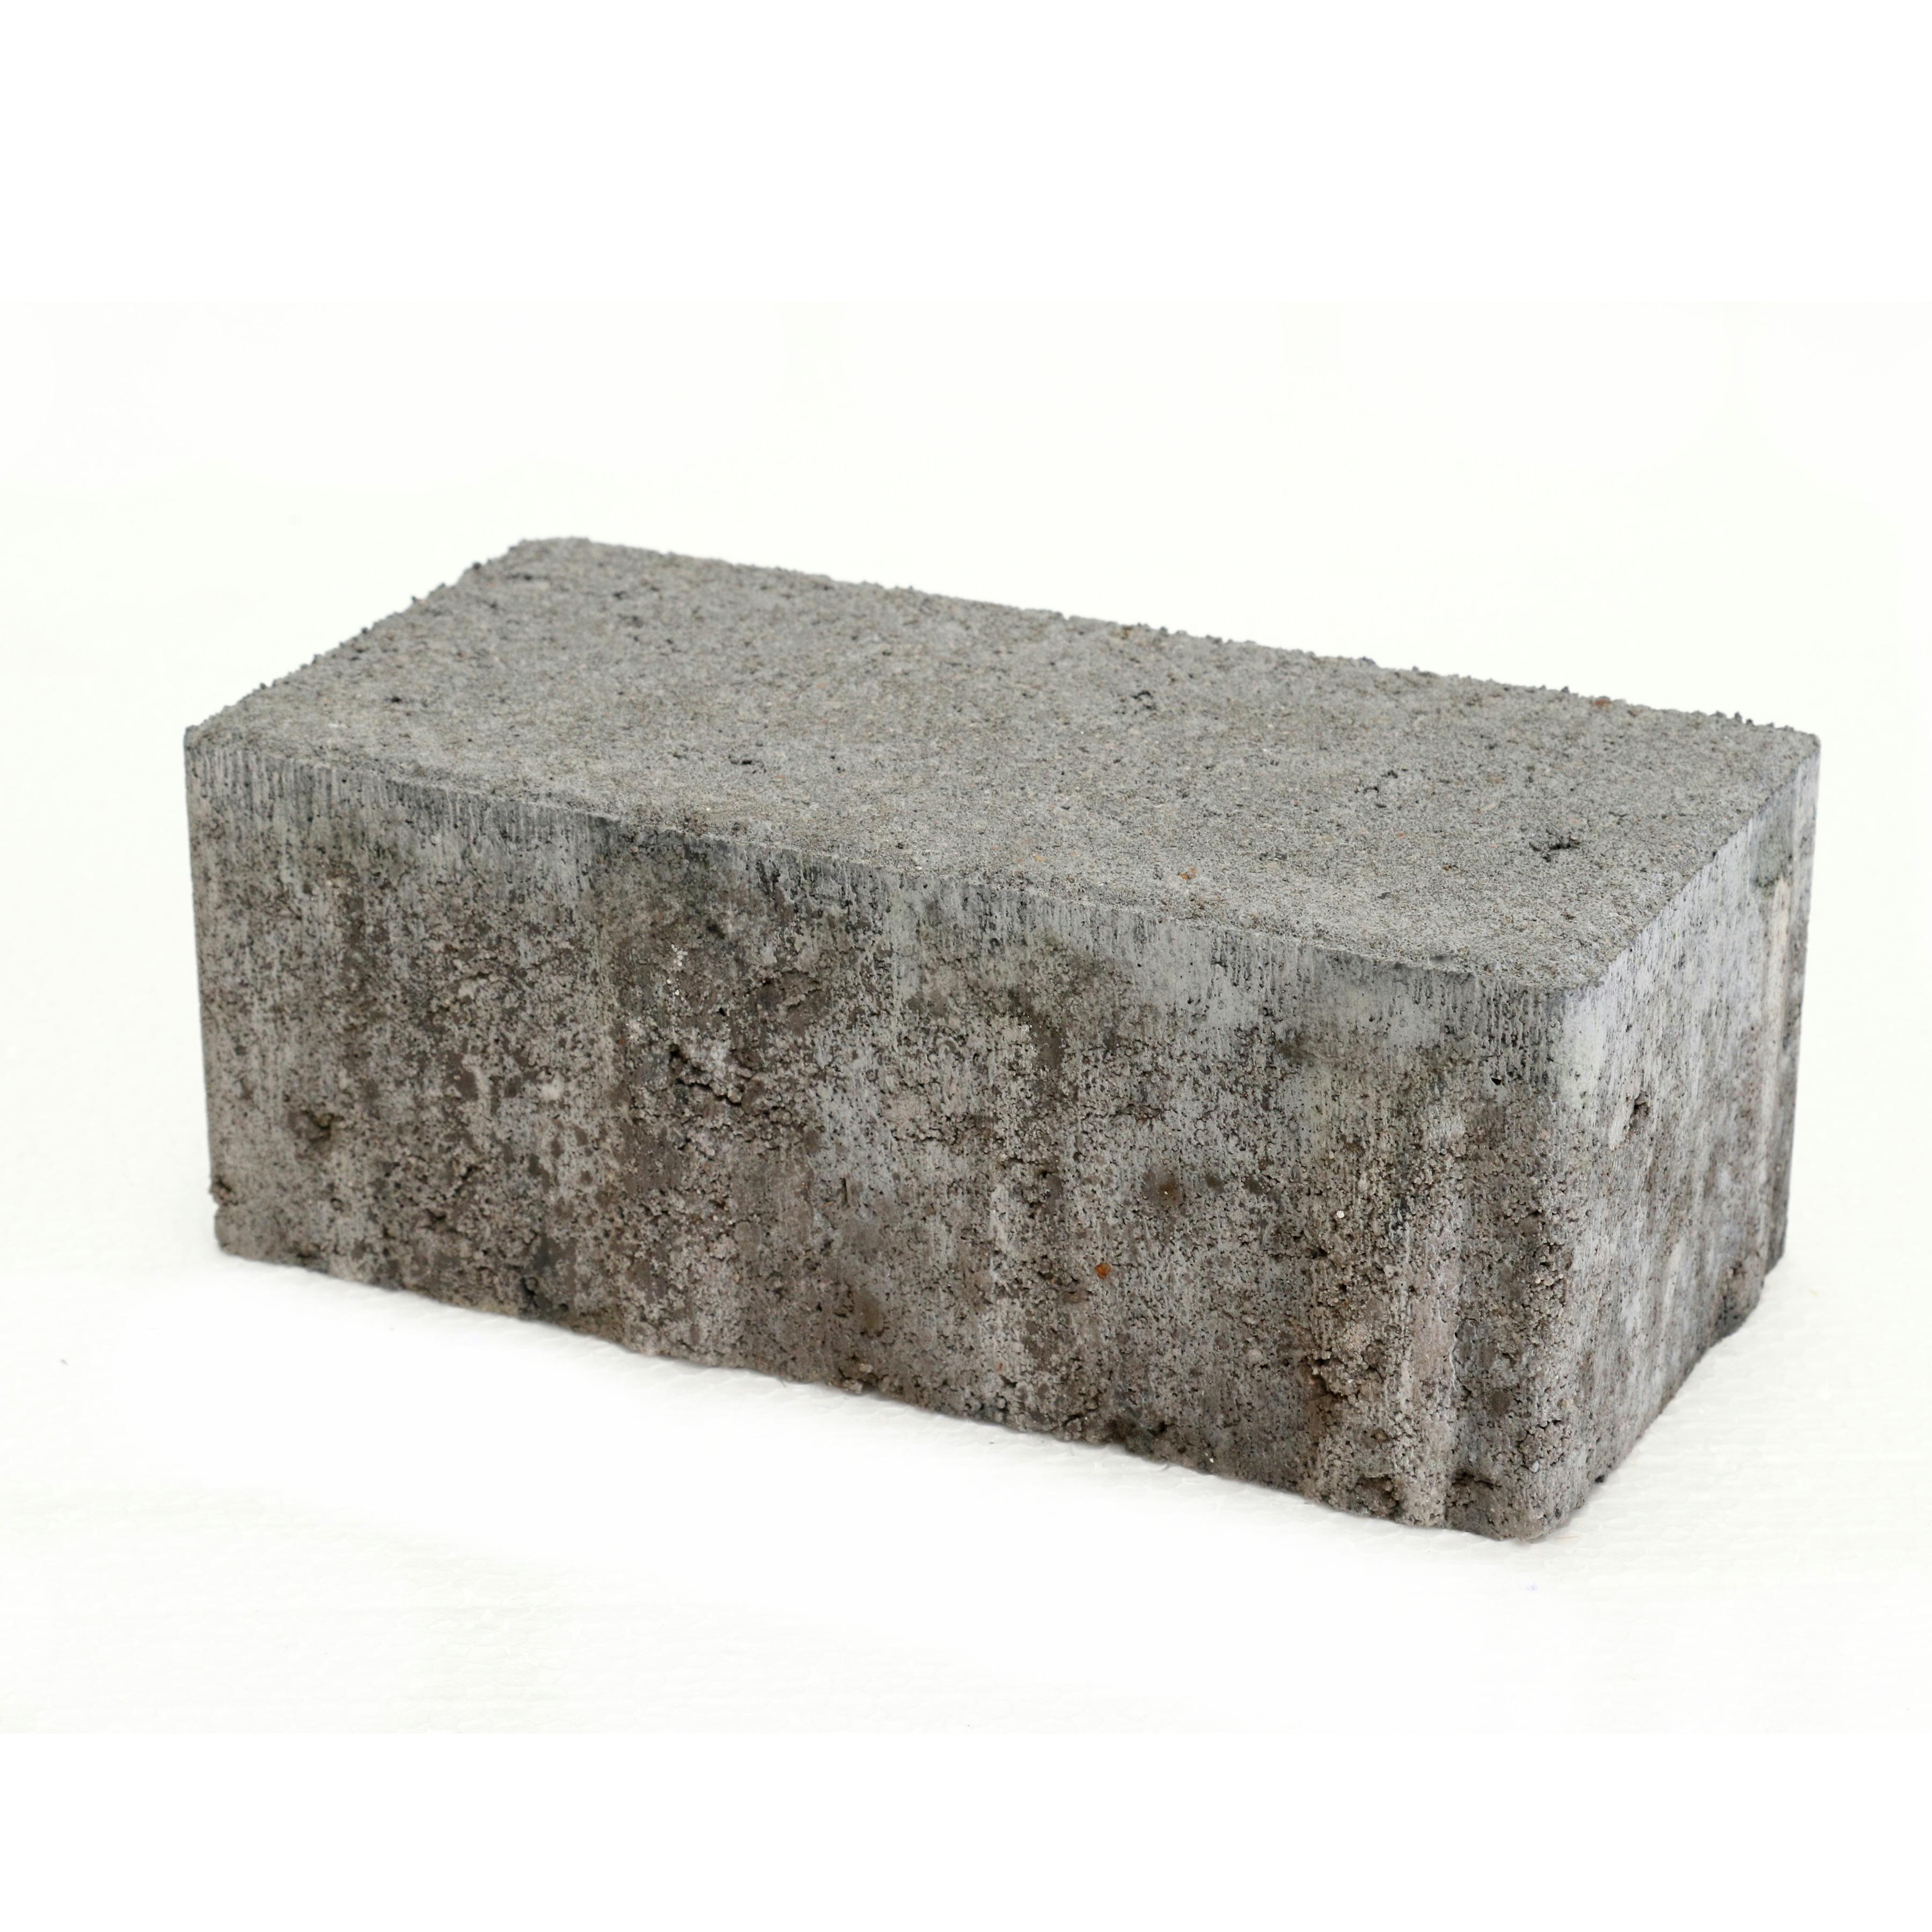 Klinker Beton Grijs 21x10,5x8 cm - Per Stuk - 0,02 m2